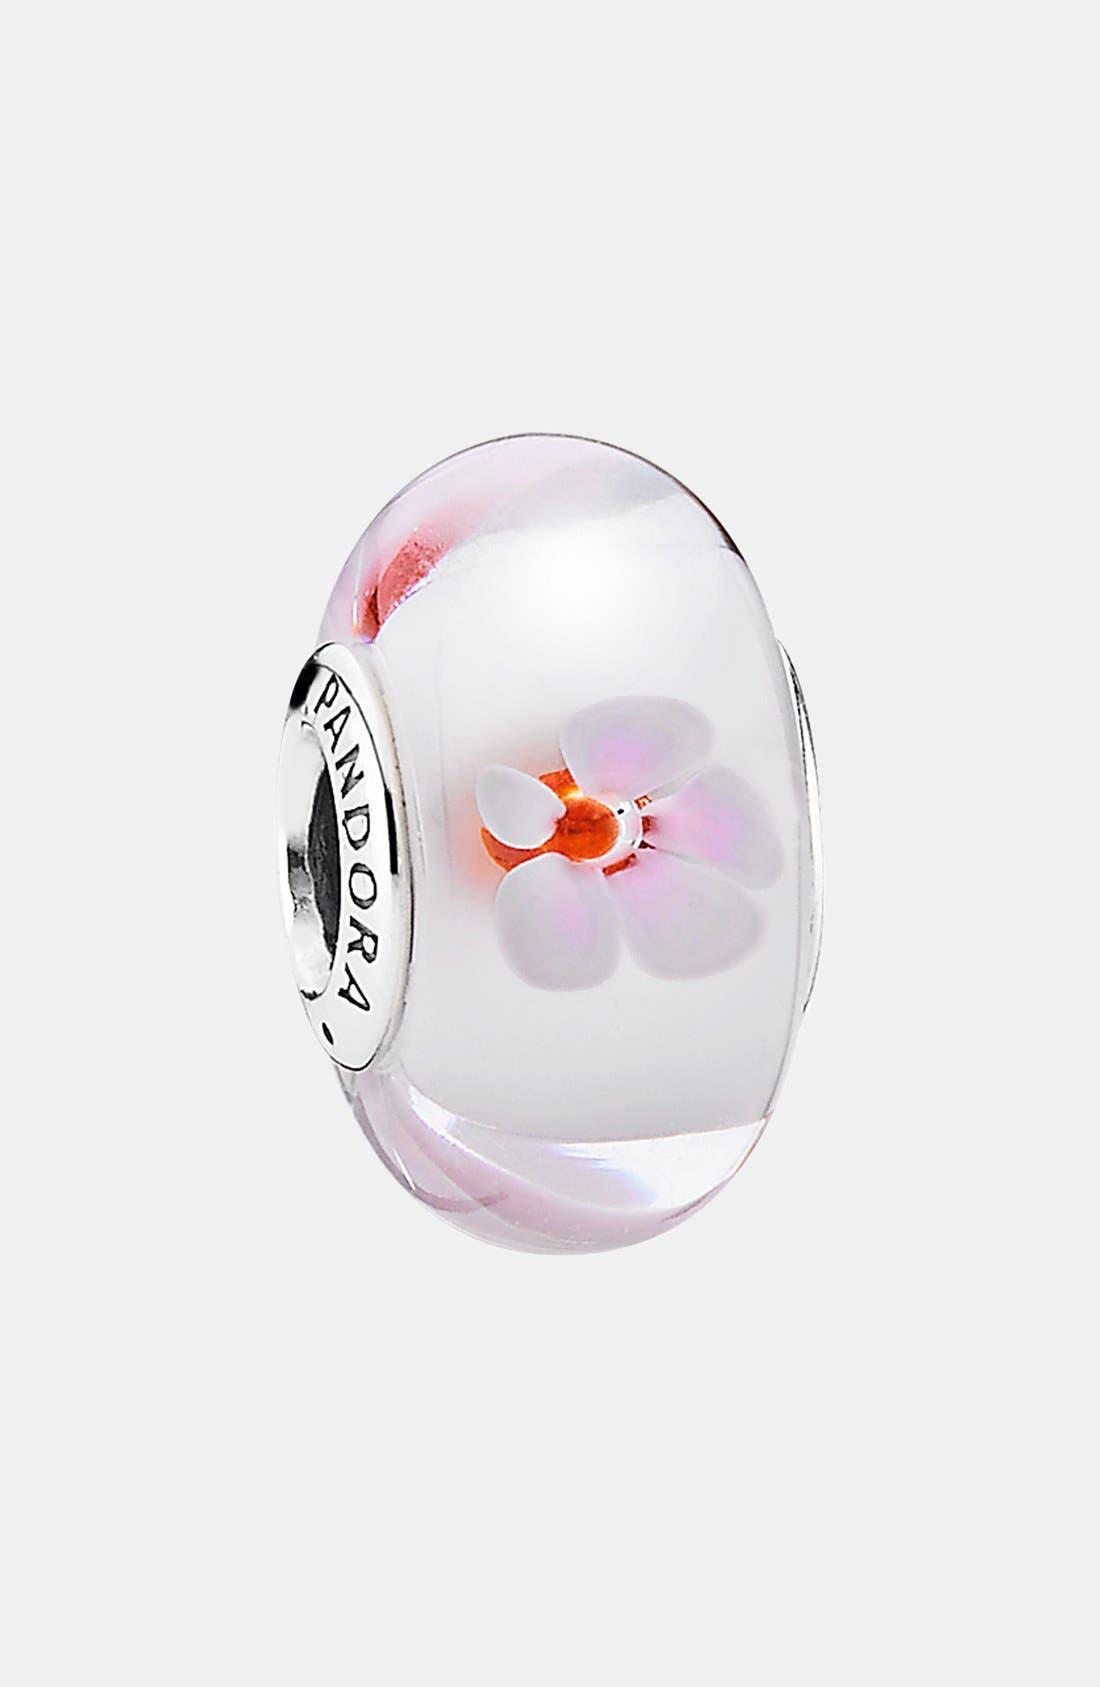 Alternate Image 1 Selected - PANDORA 'Cherry Blossom' Murano Glass Charm